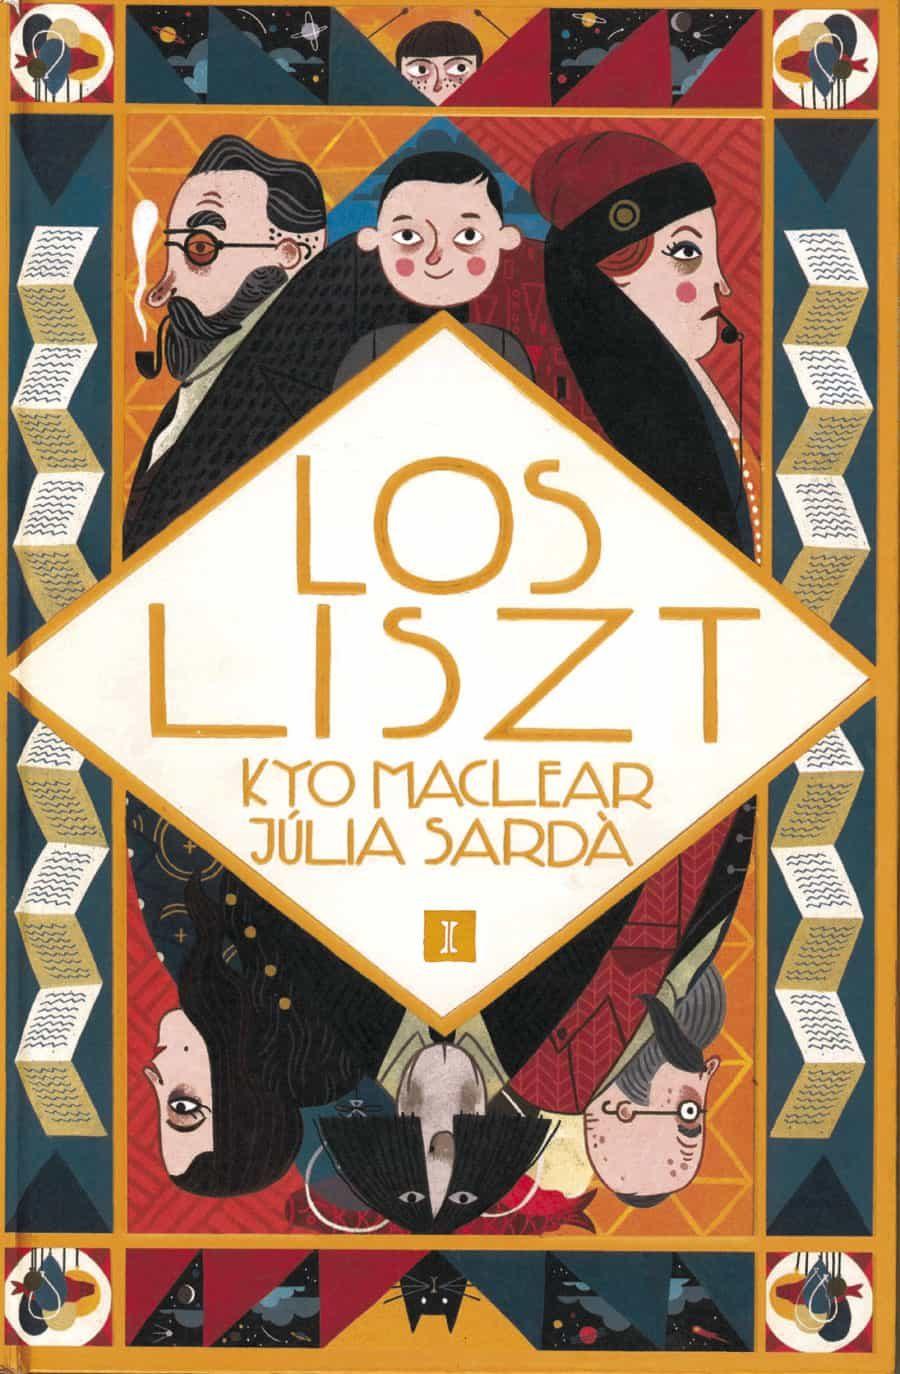 Los Liszt por Kyo Maclear